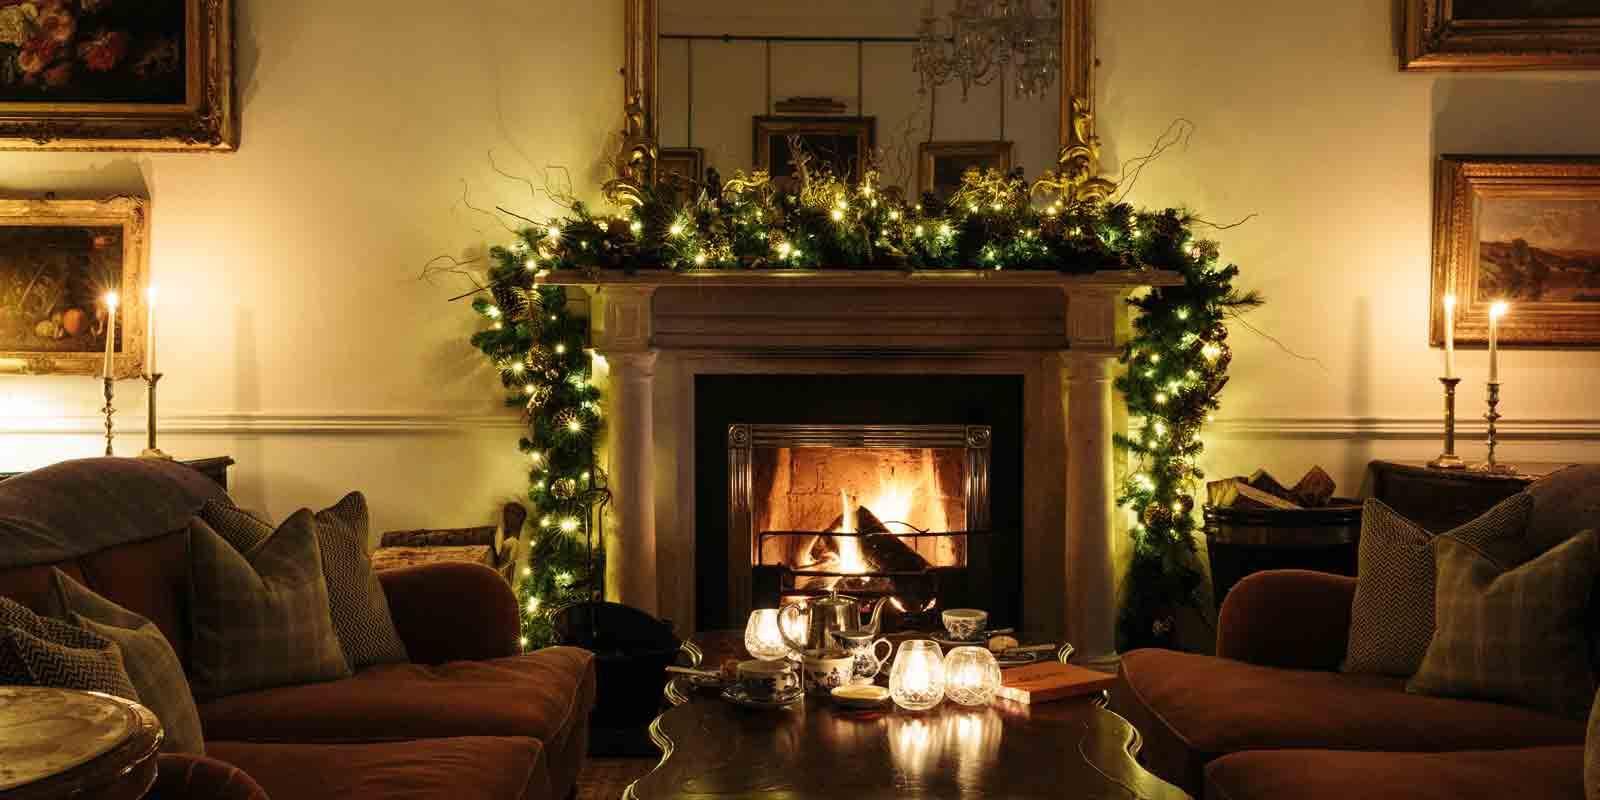 Ballynahinch Hunts Room at Christmas